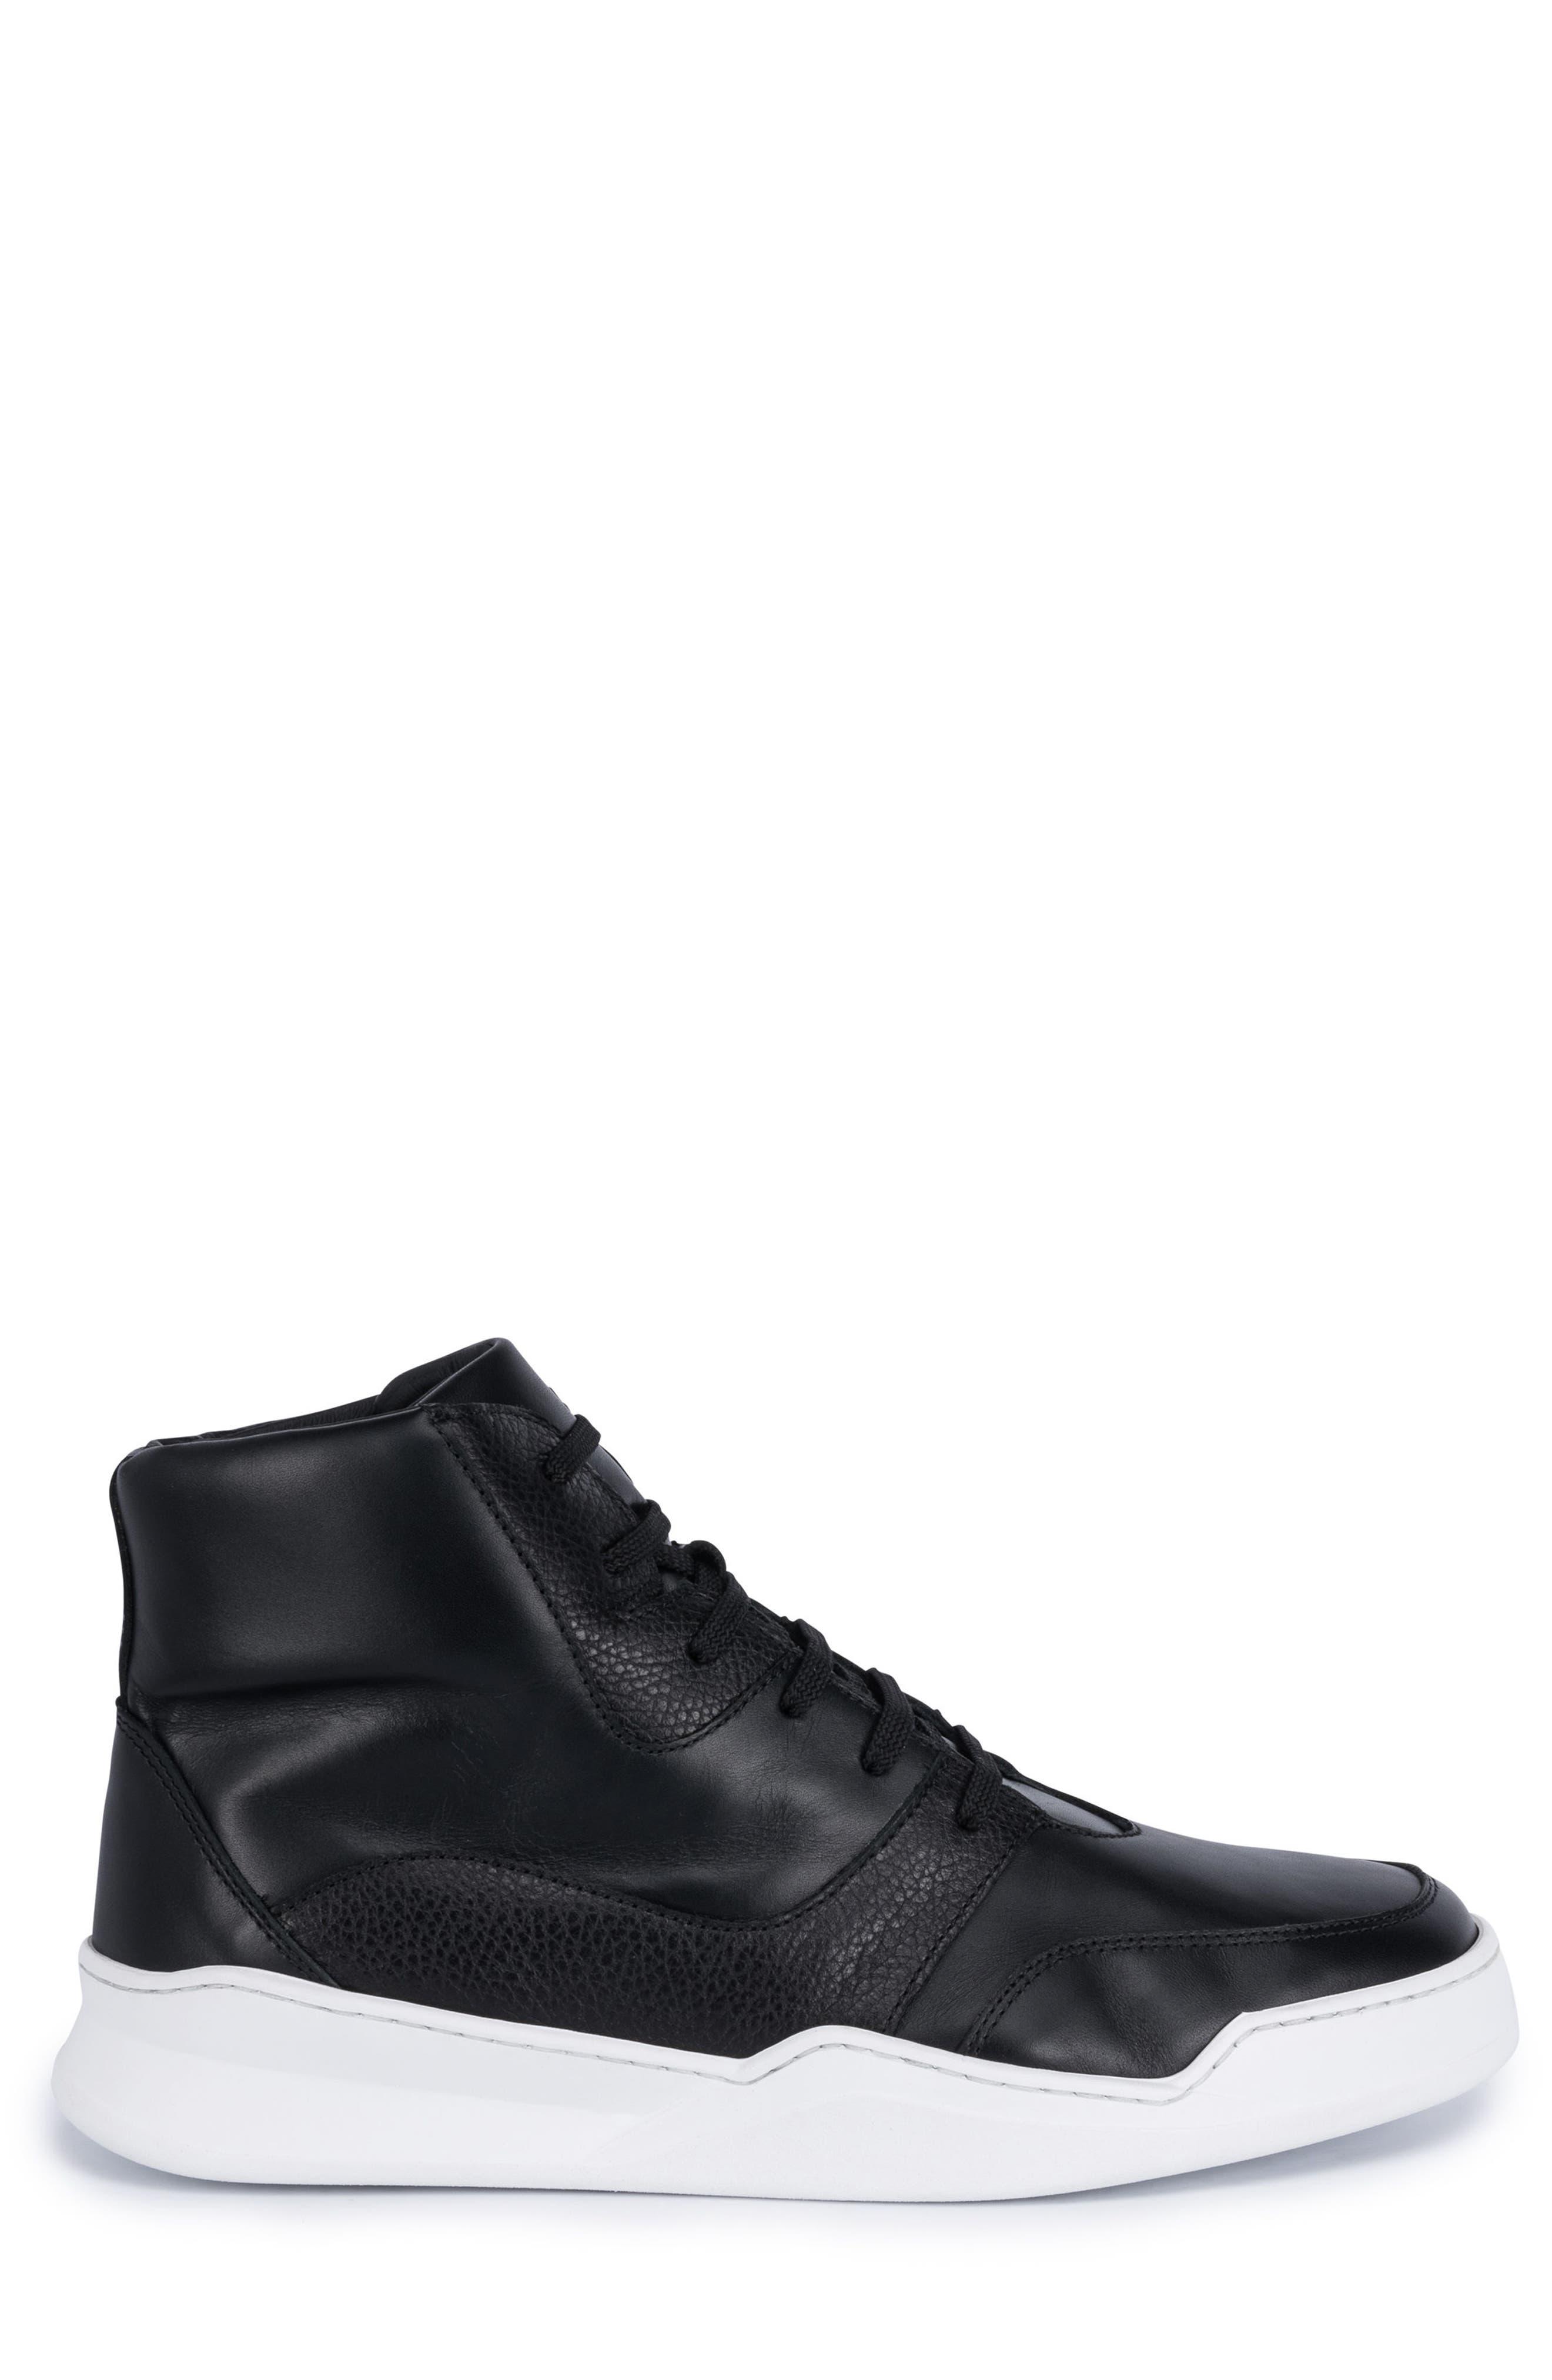 Carrara Sneaker,                             Alternate thumbnail 3, color,                             001